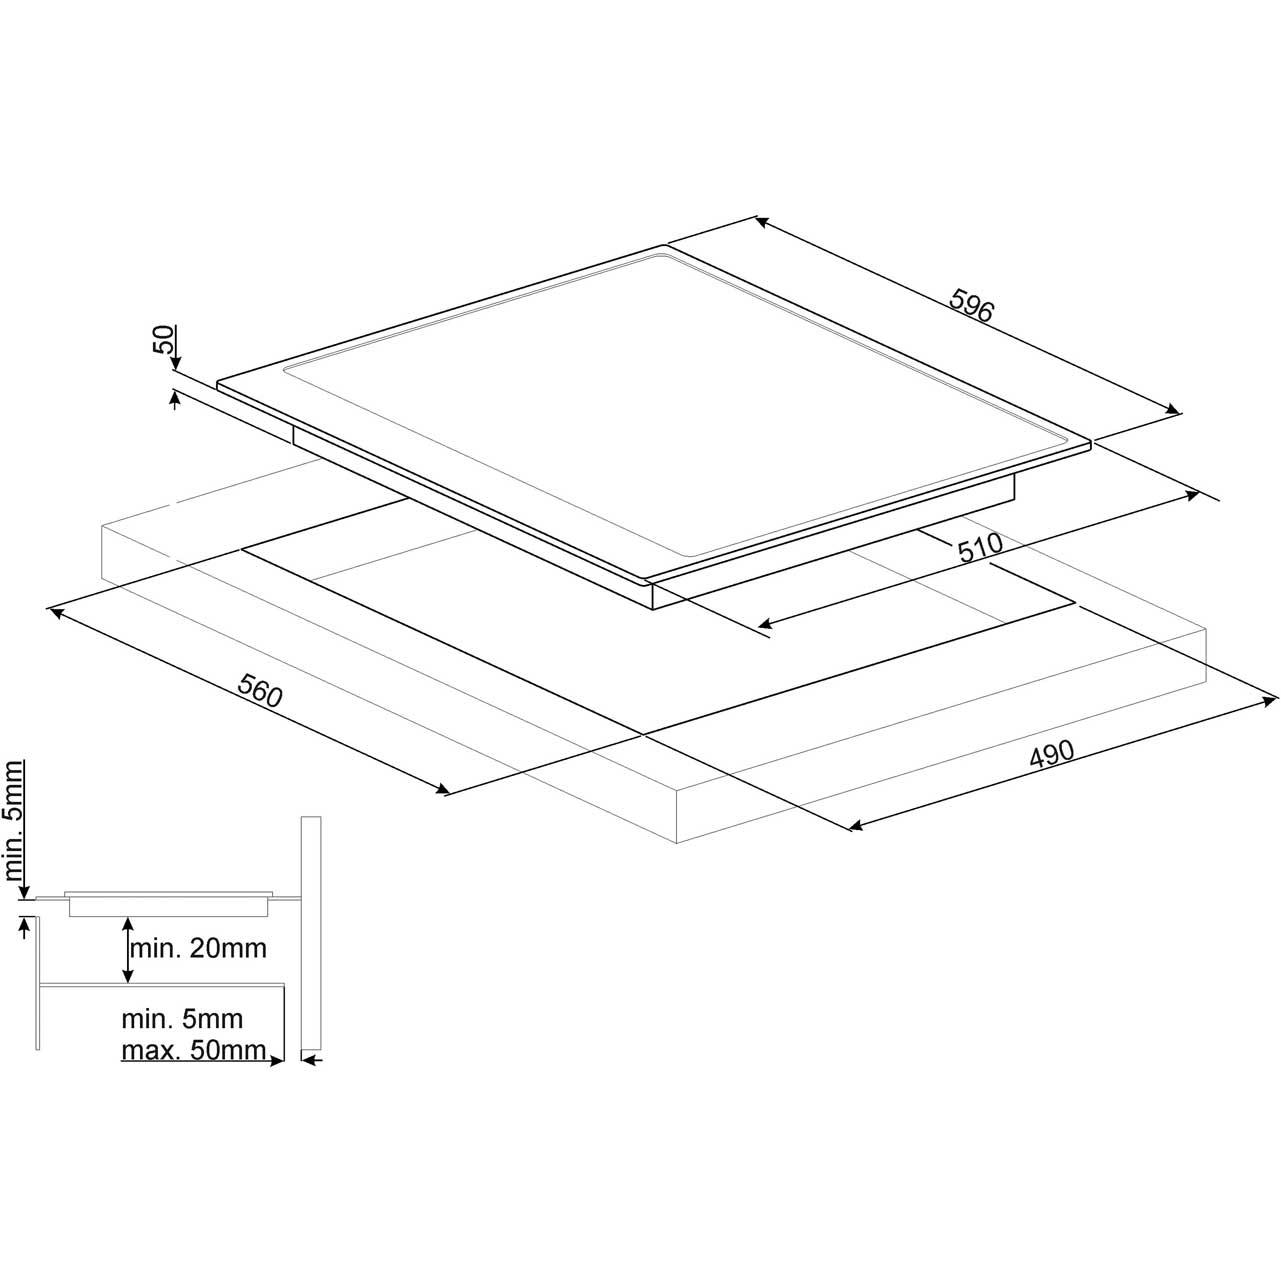 kfx 80 wiring diagram complete wiring diagrams u2022 rh oldorchardfarm co